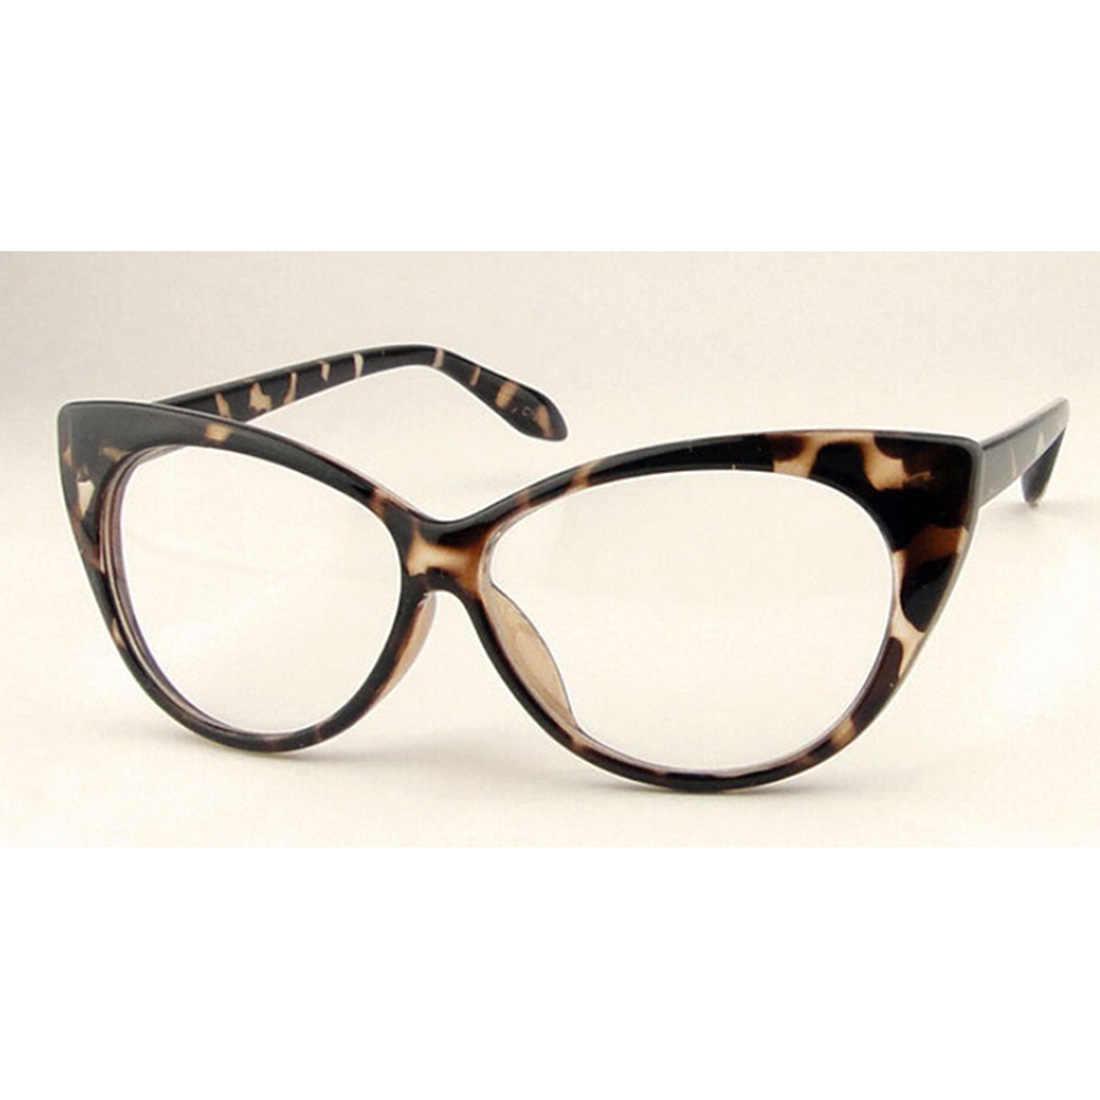 0a705c2fd5 ... Marco de gafas con forma de ojos de gato elegante moderno para mujeres  monturas ópticas de ...